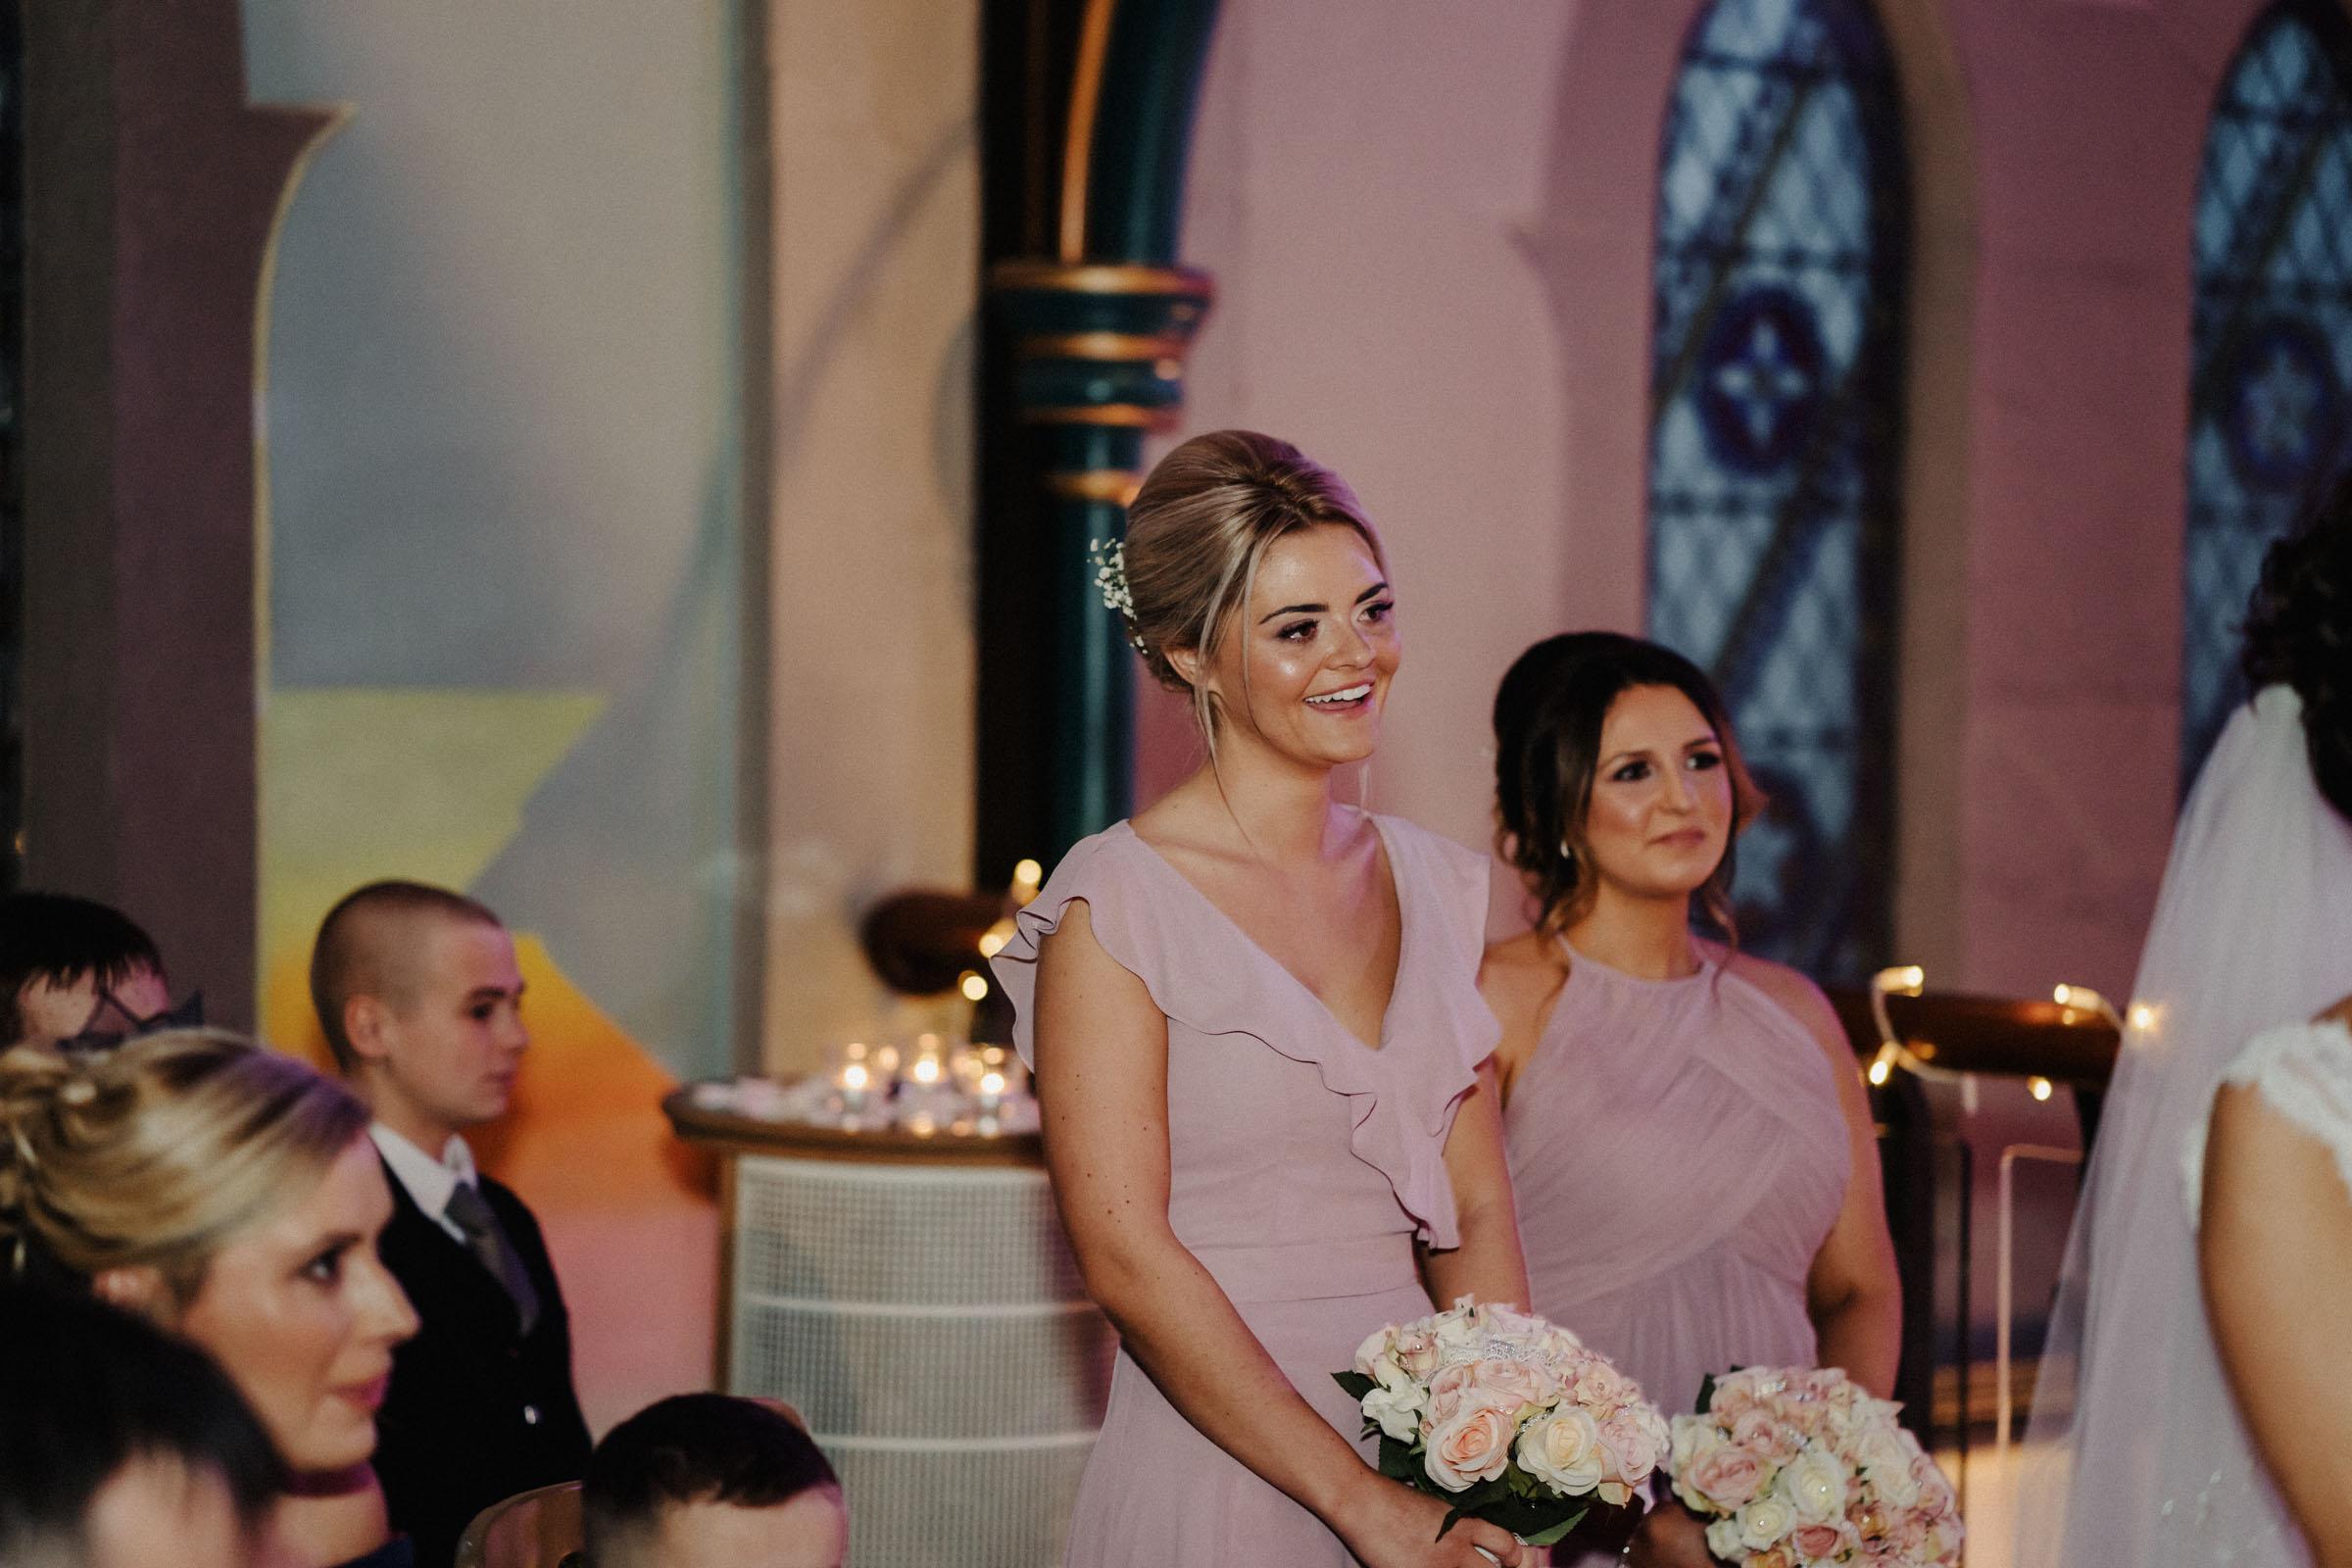 Oran-Mor-Wedding-Photographer-DearlyPhotography (16 of 55).jpg